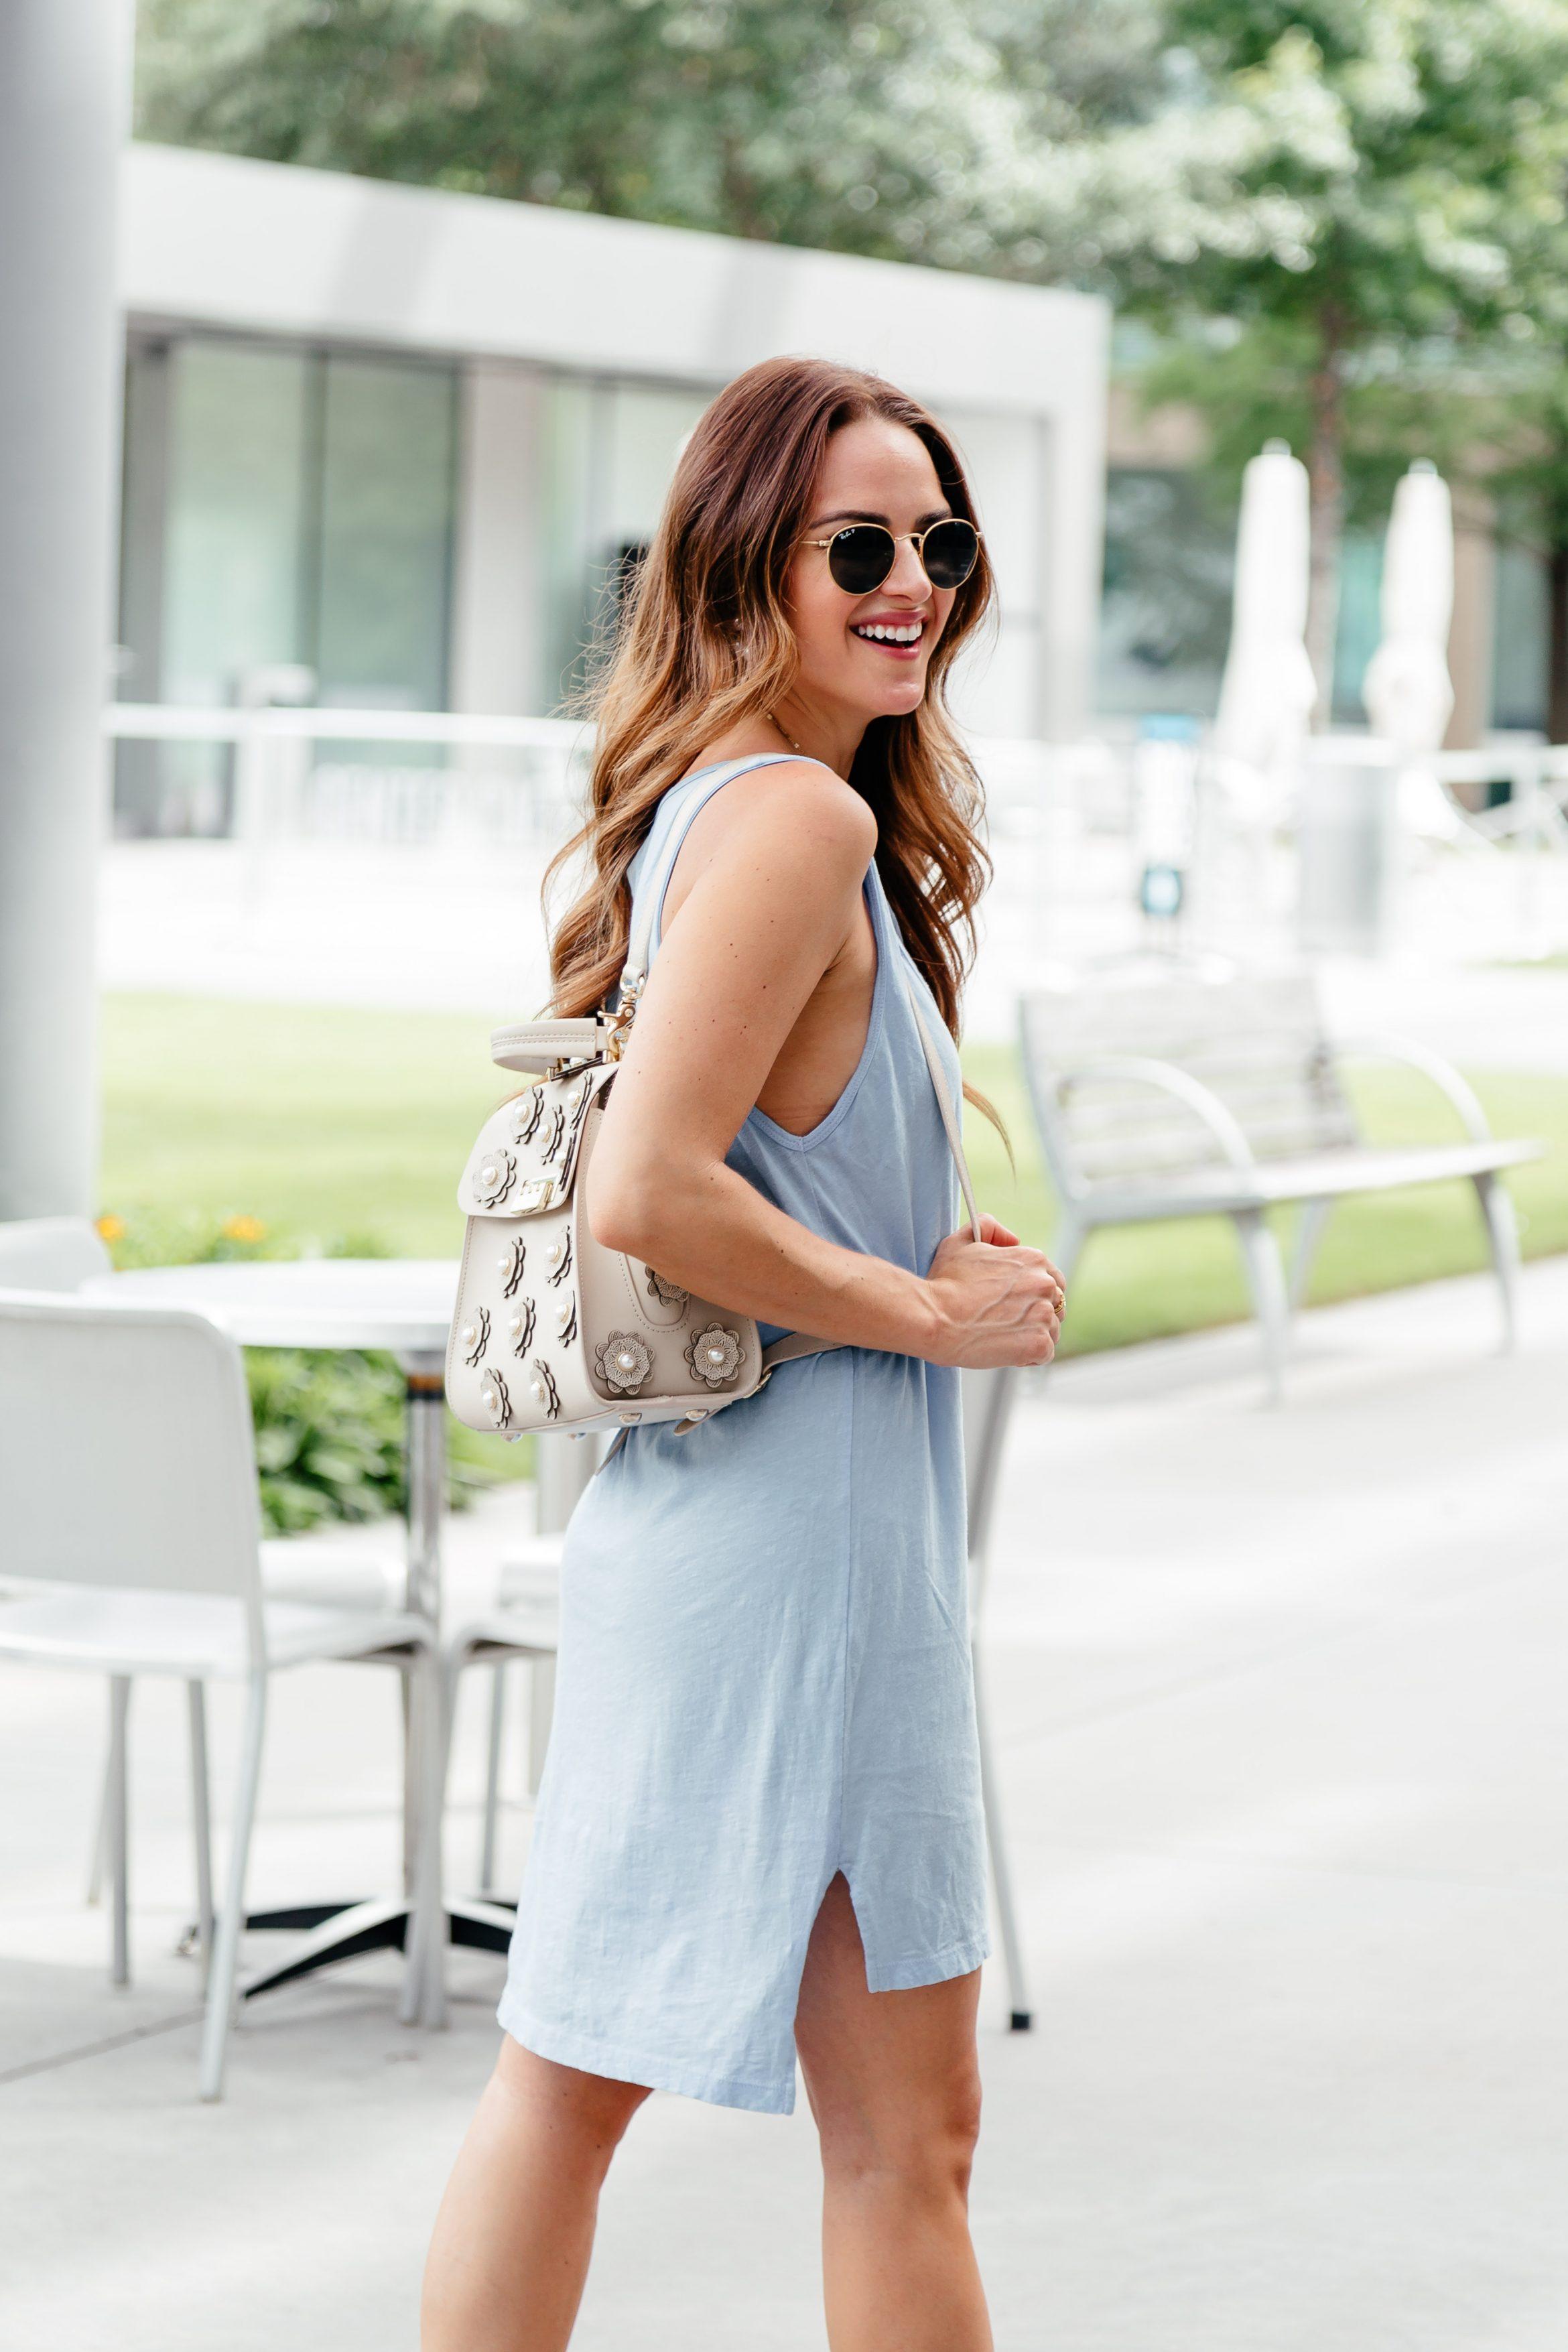 e6b1f905f5da Easy Summer Look  Tshirt Dress   Backpack with flat statement sandals via A  Lo Profile